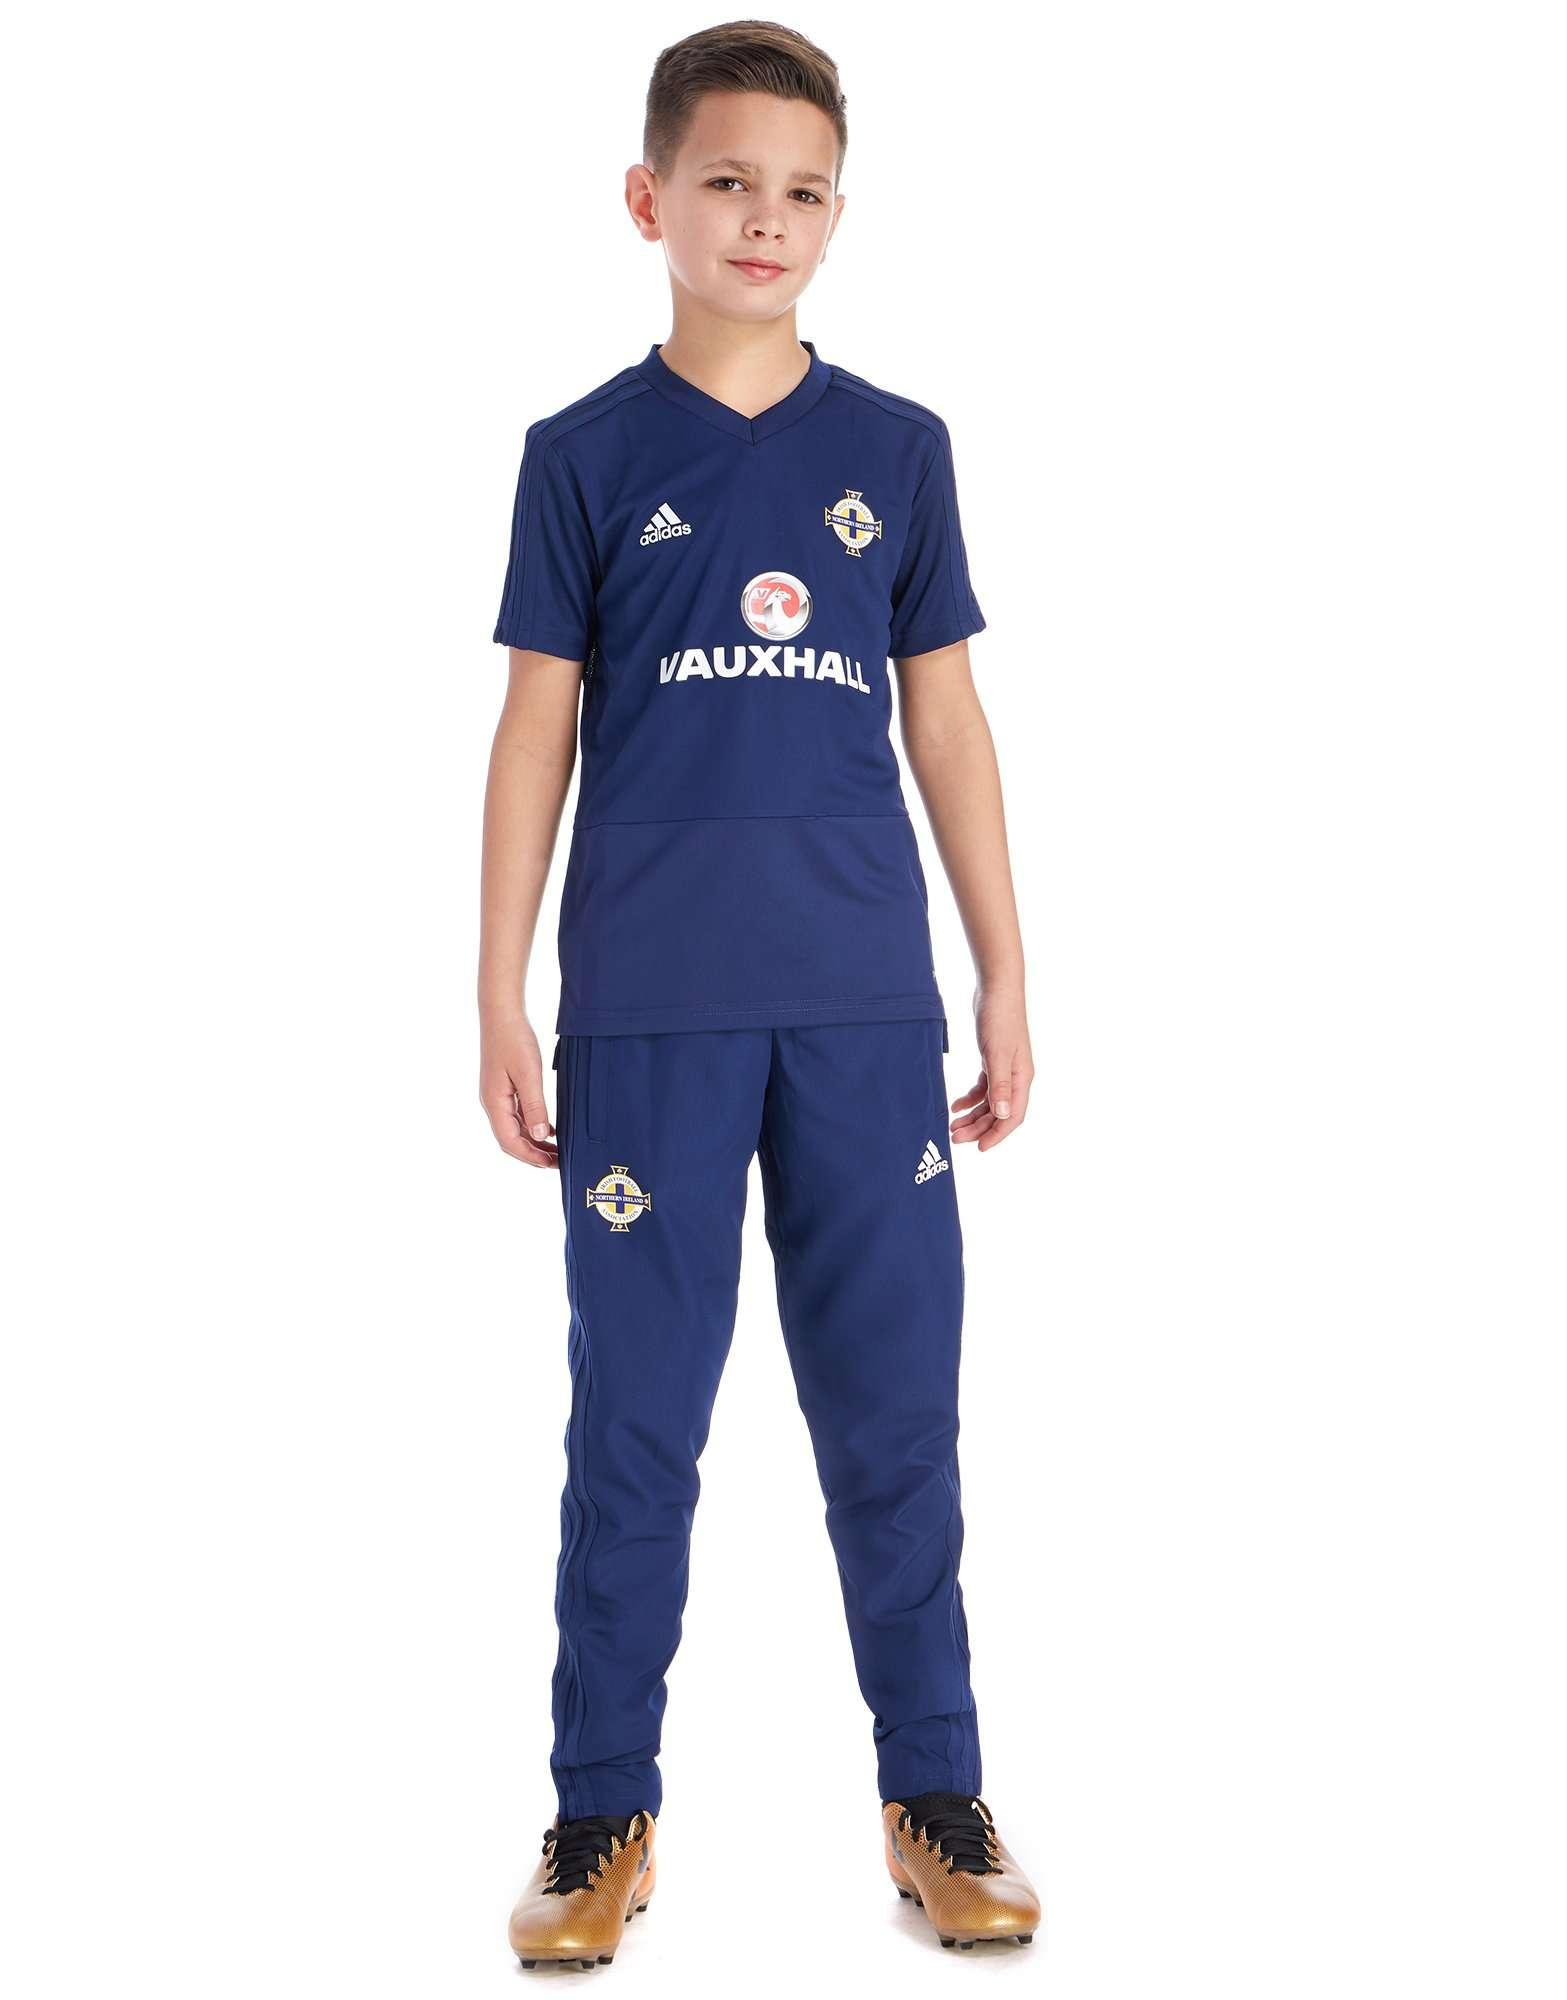 adidas Northern Ireland 2018/19 Training Shirt Junior